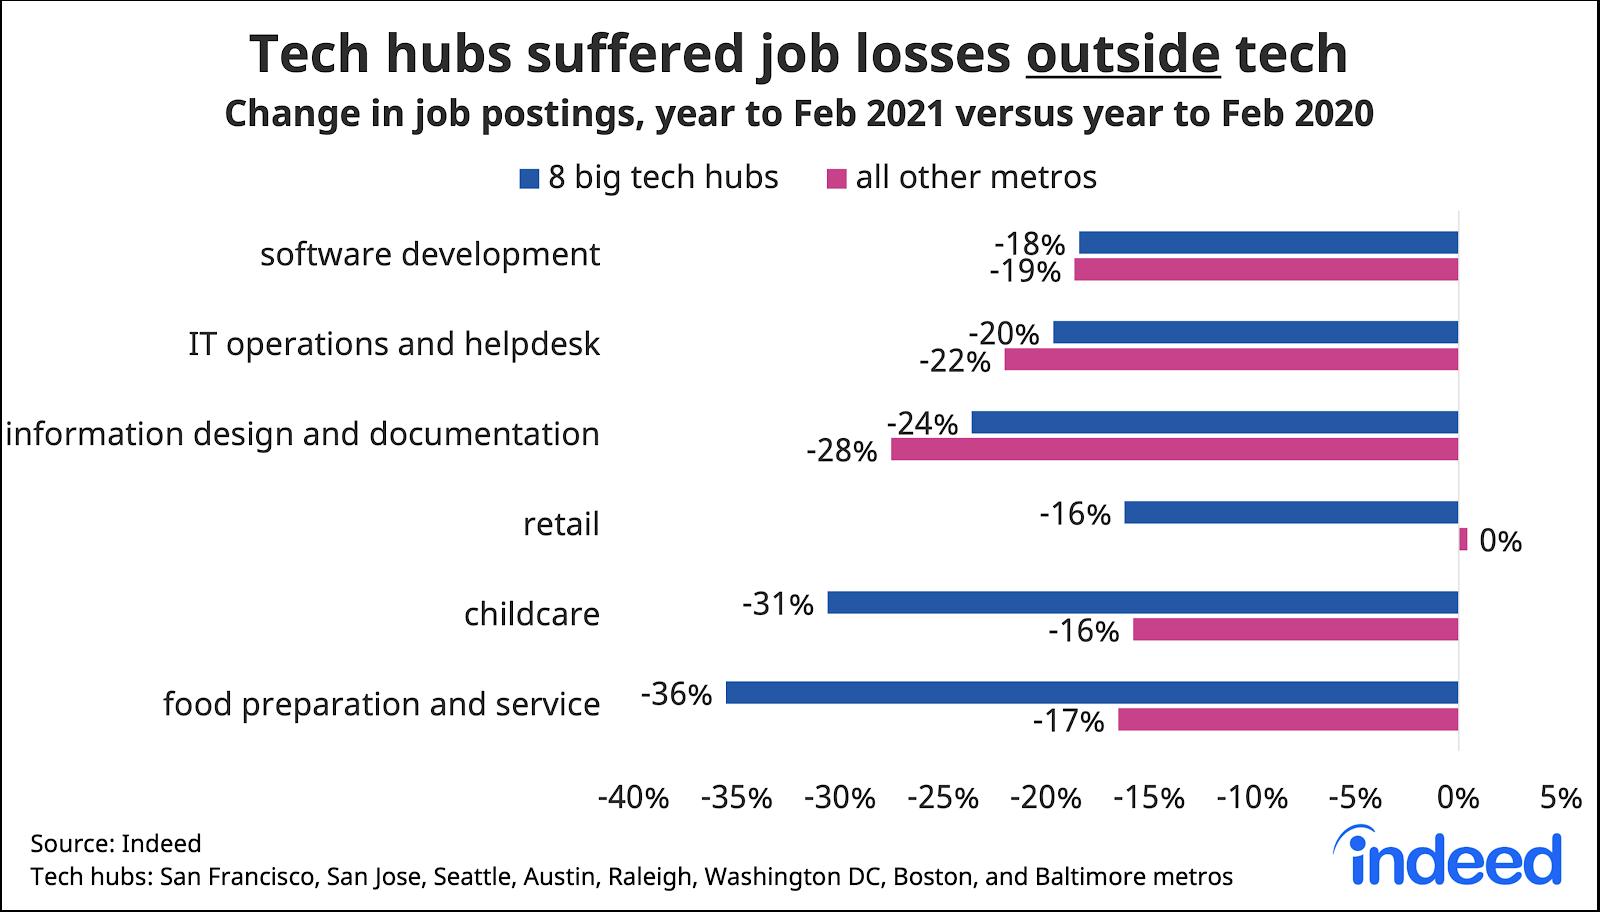 Bar graph showing tech hubs suffered job losses outside tech